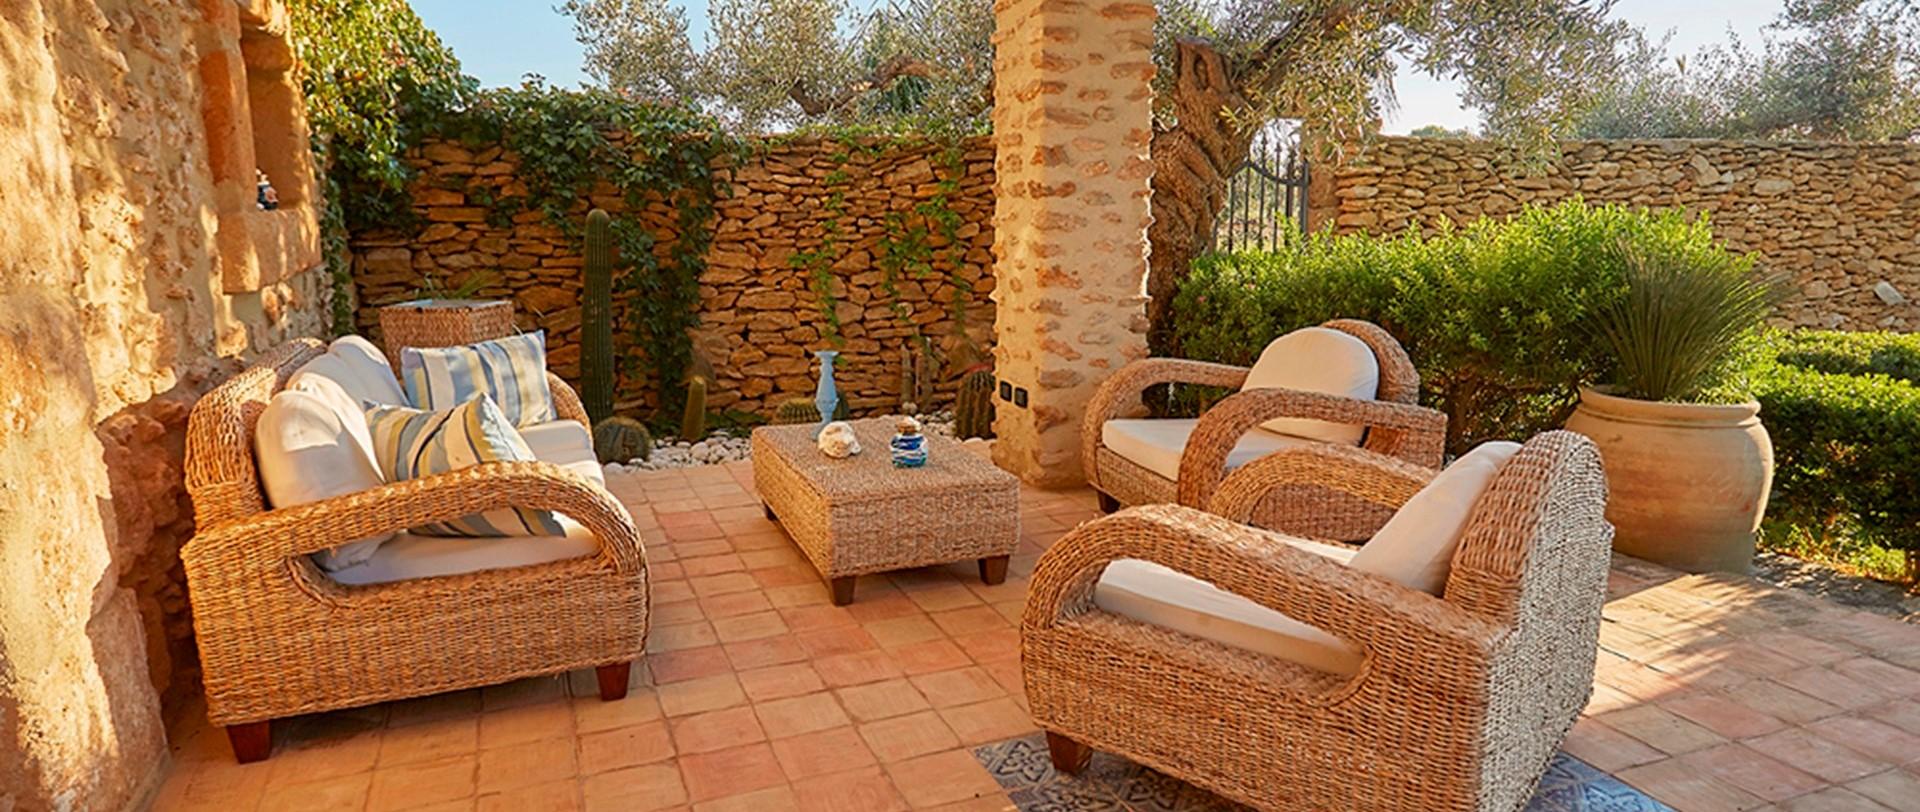 villa-selinunte-sicily-sun-terrace-seati